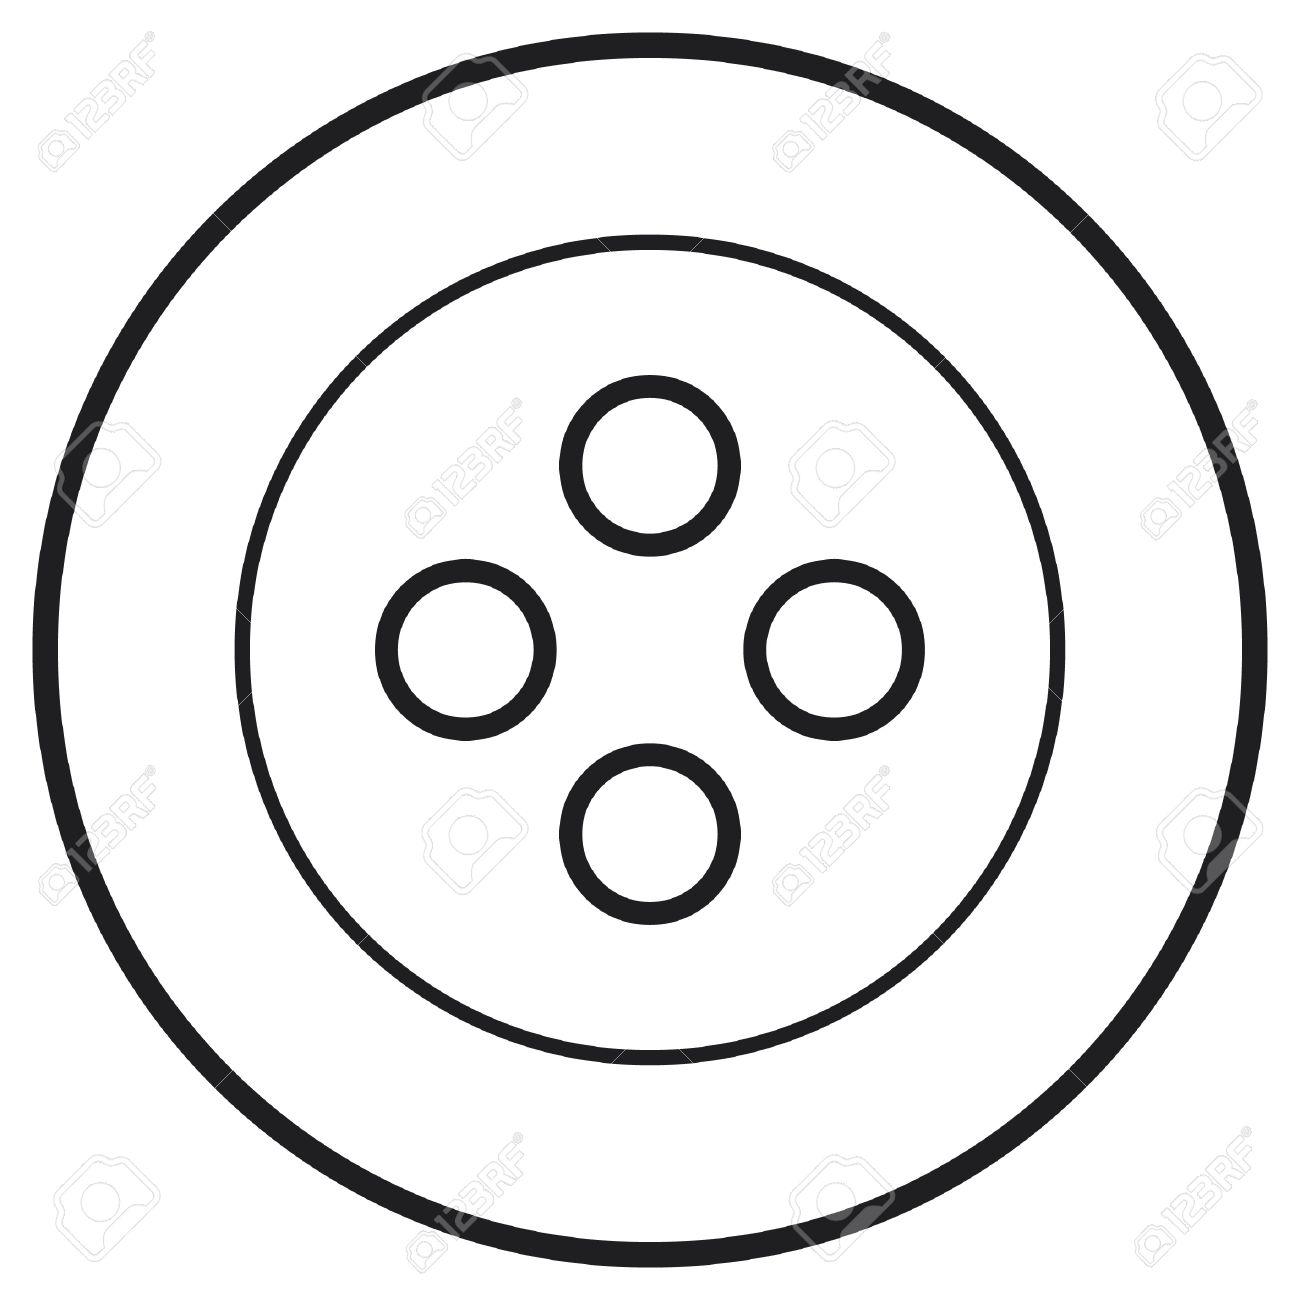 Black buttons clipart clip art download Button clipart black and white 1 » Clipart Station clip art download